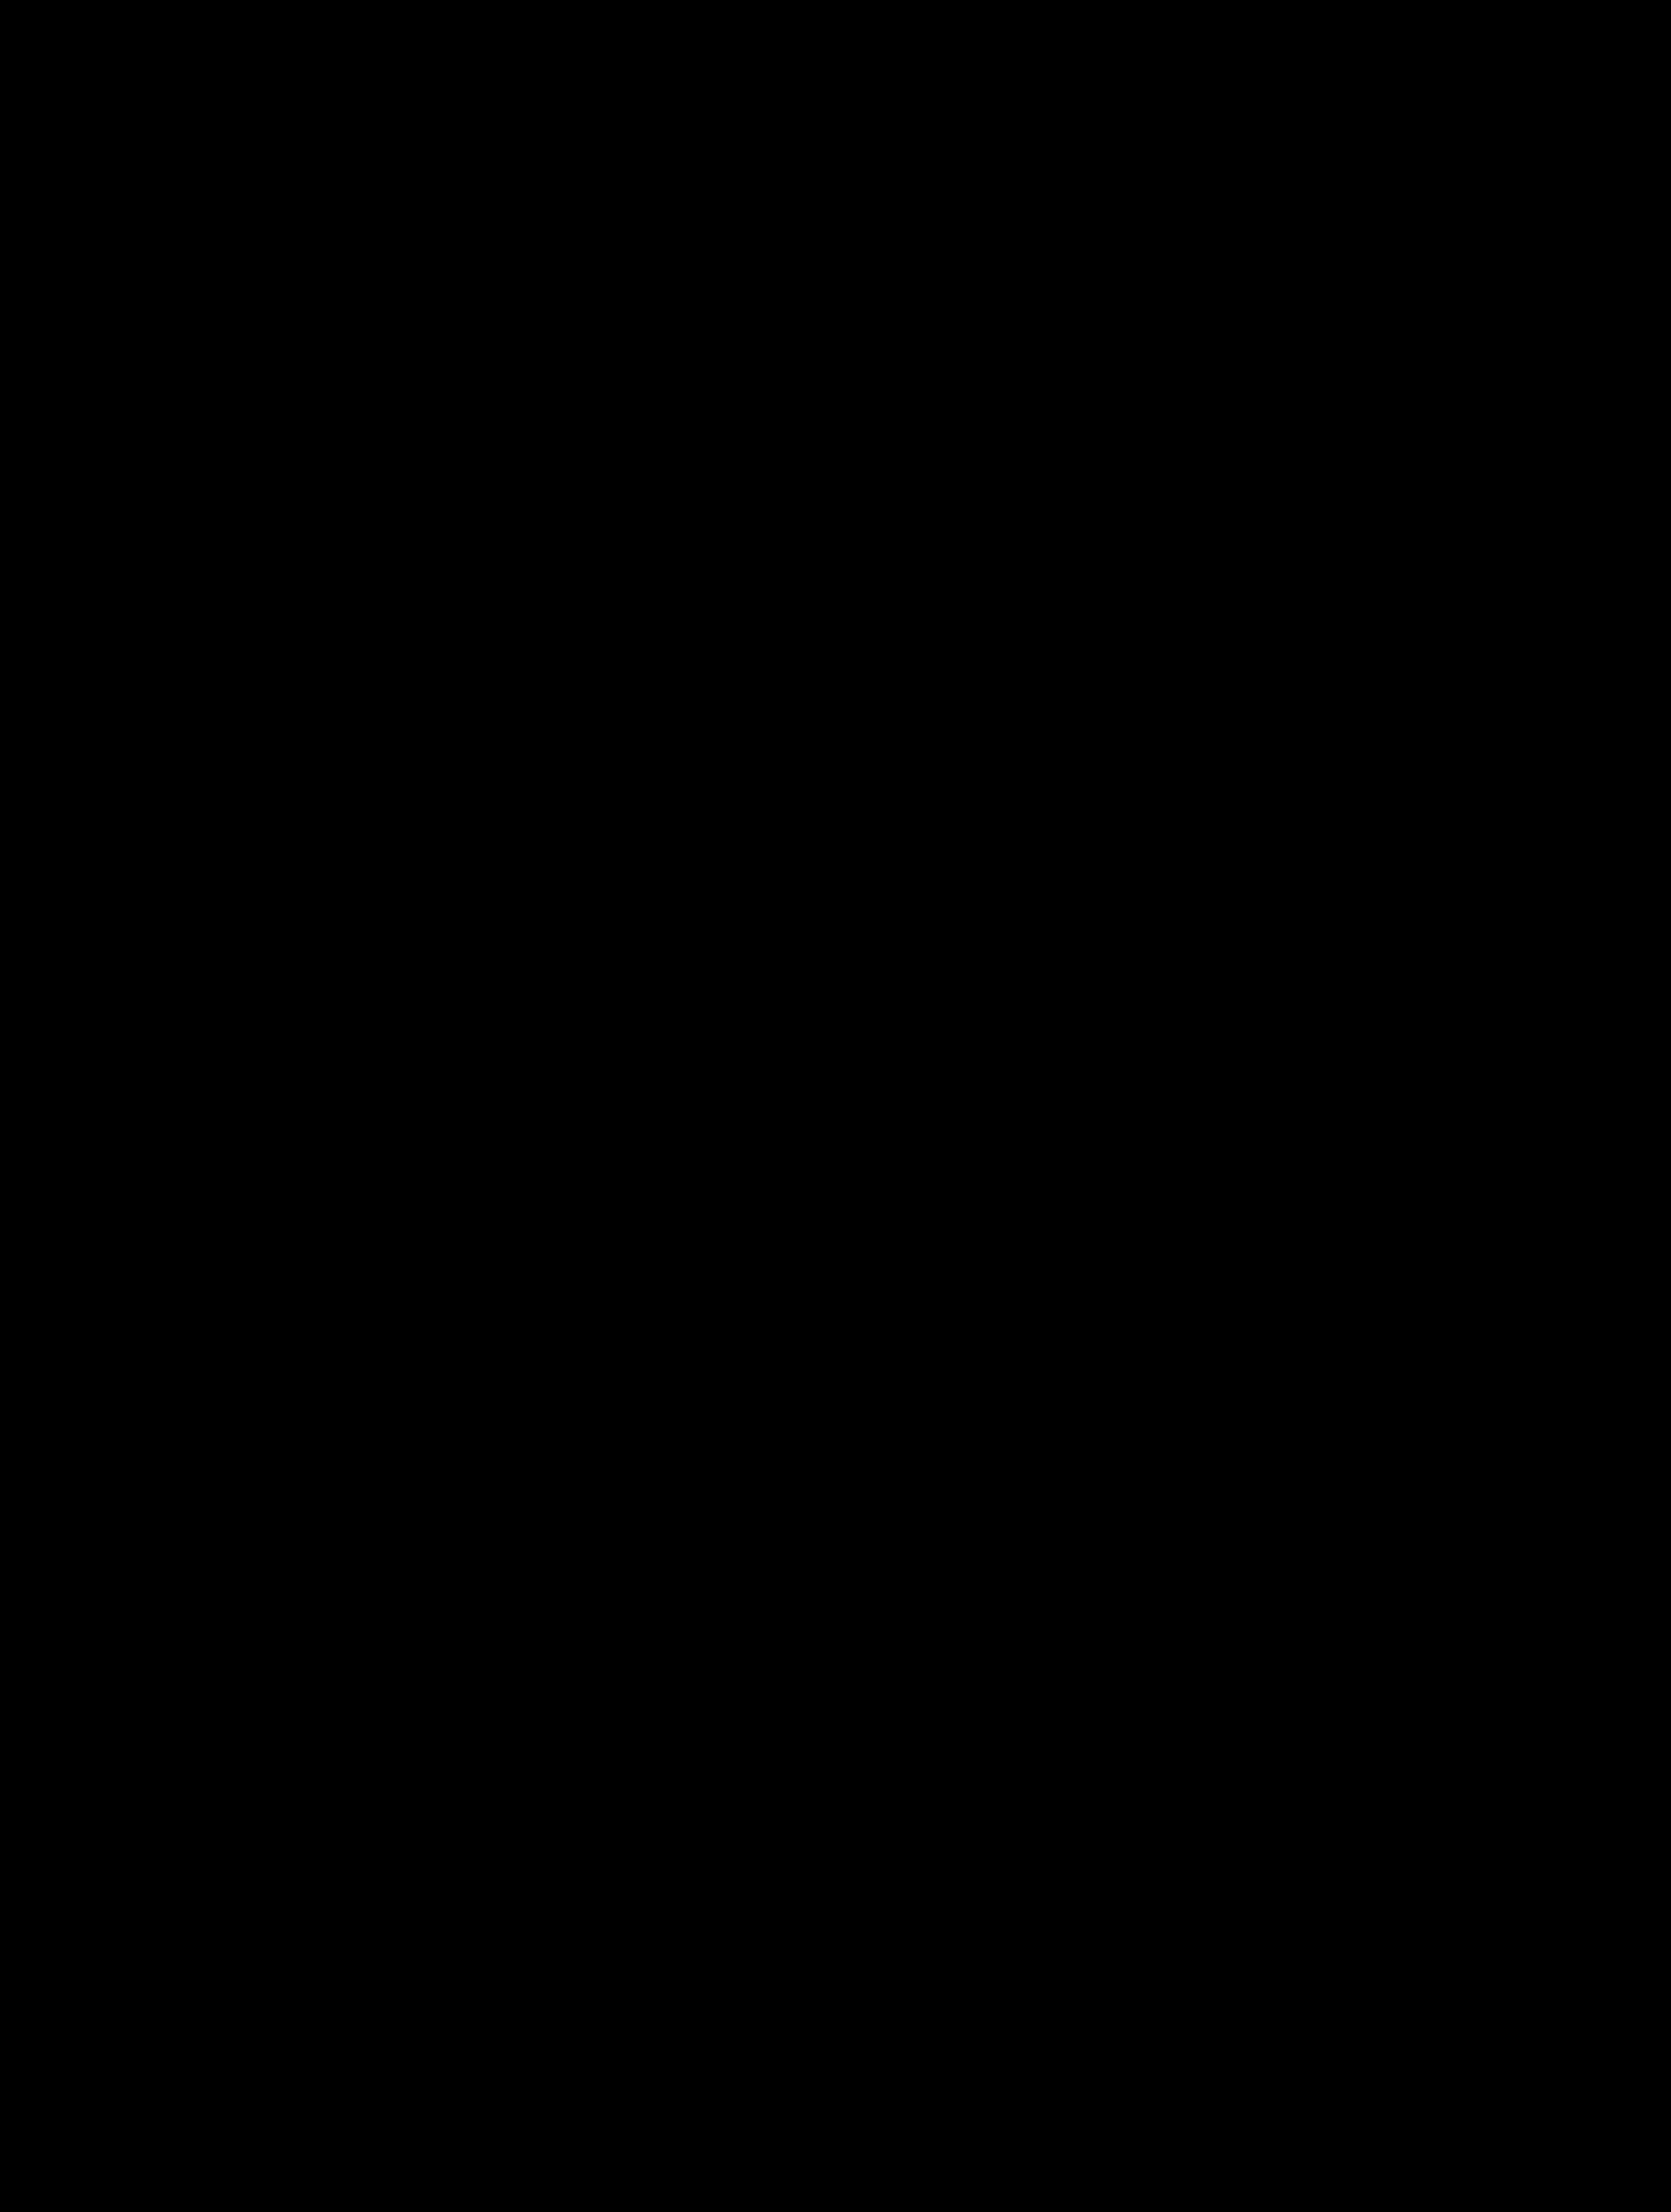 1813x2400 Text Box Frame Transparent Background Png Mart